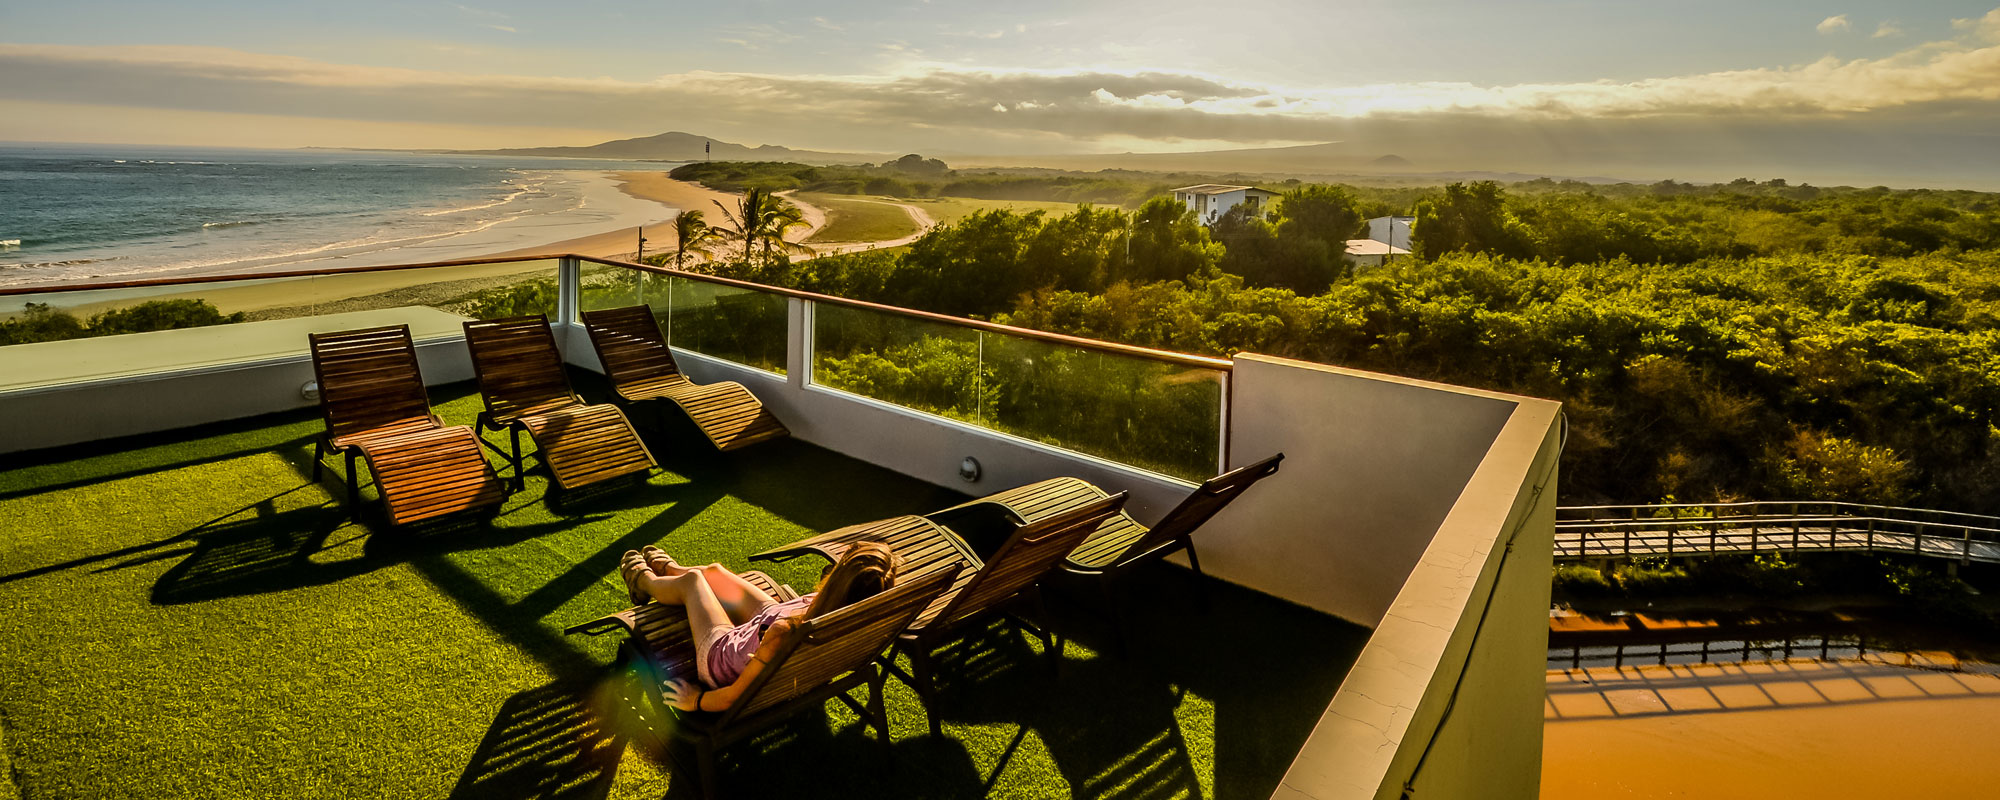 opuntia-home-banner-1 Opuntia Galapagos Hotels